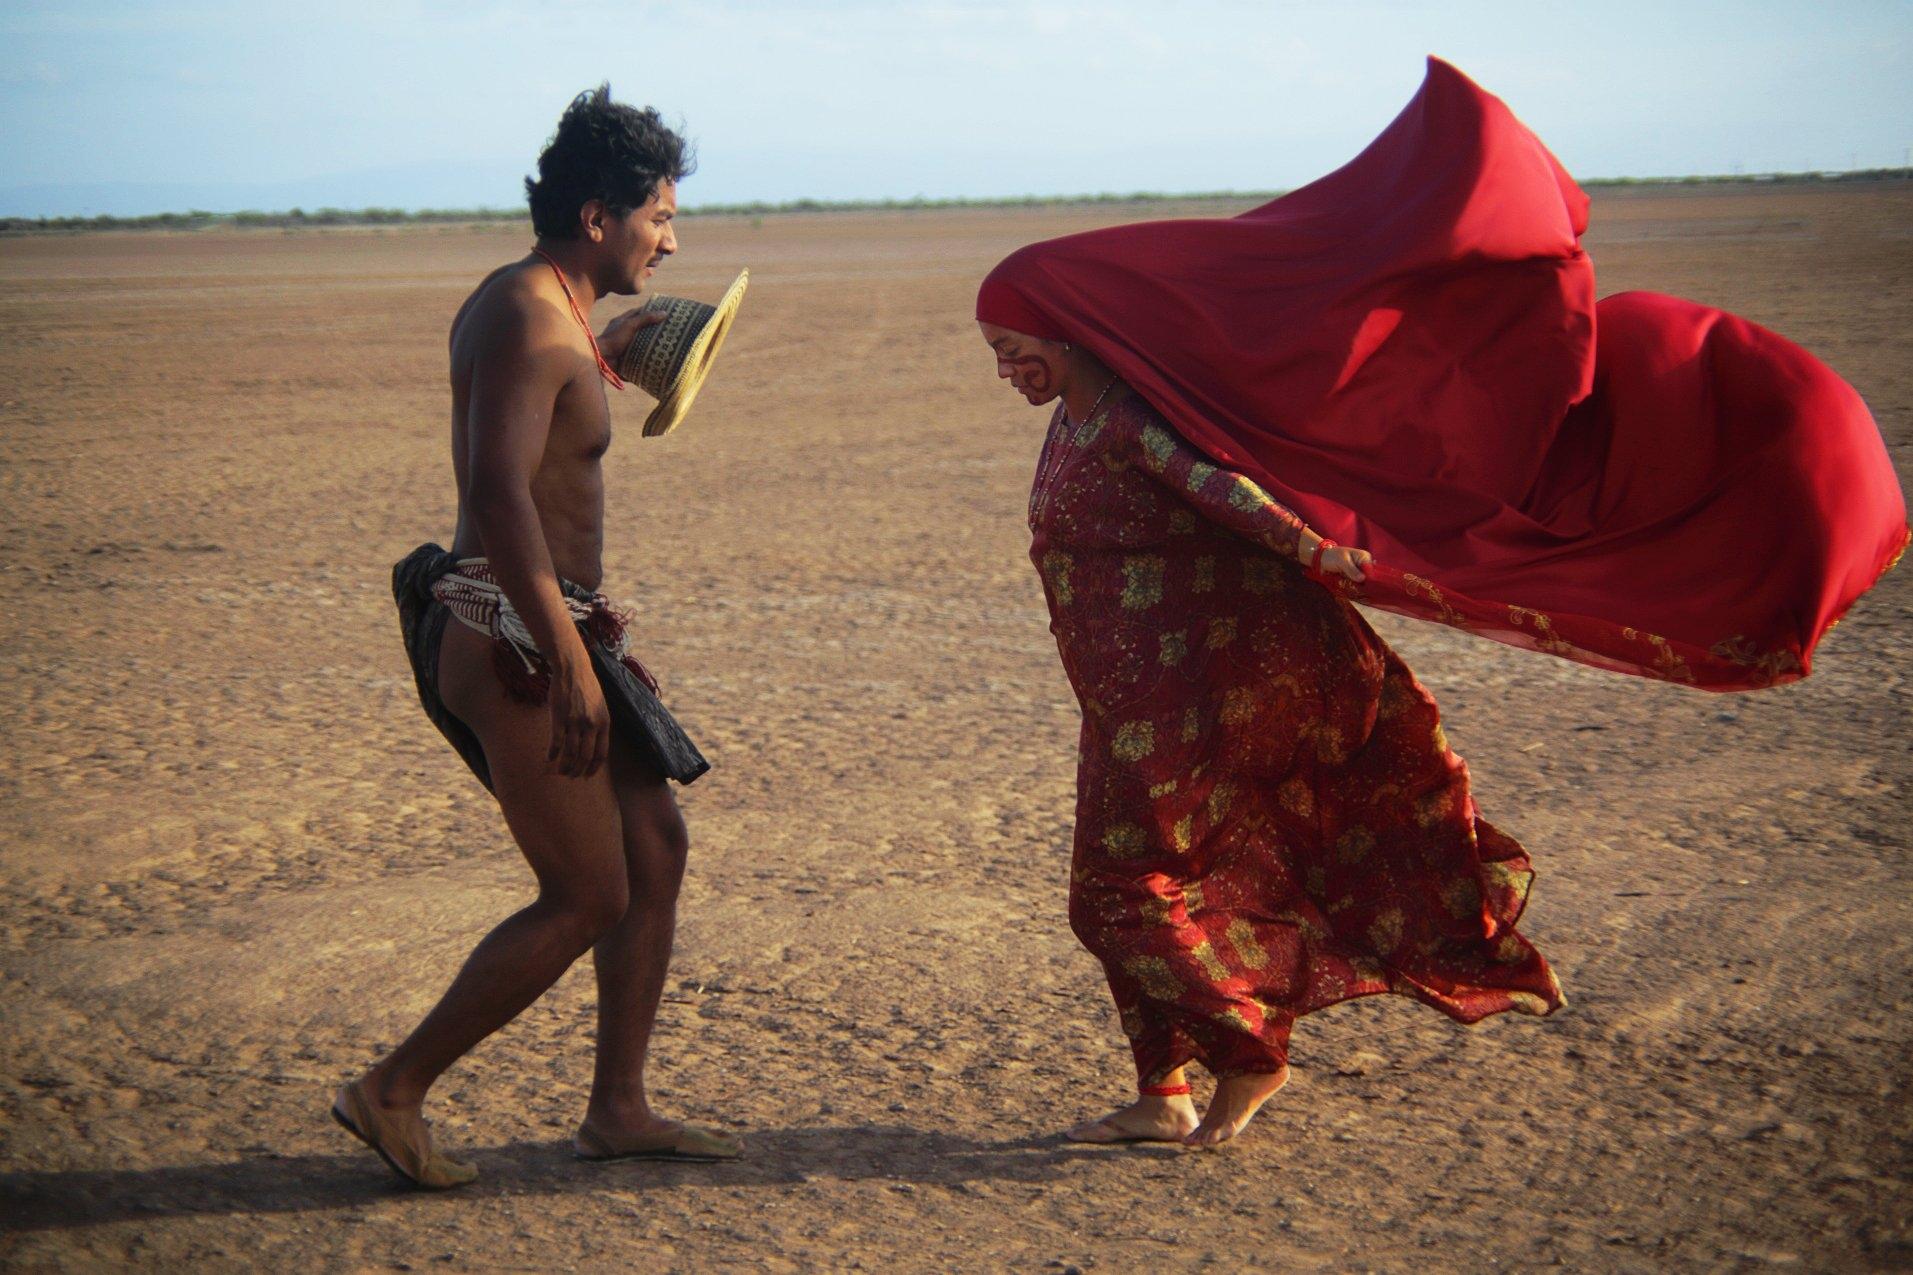 Yonna dance in Birds of Passage film